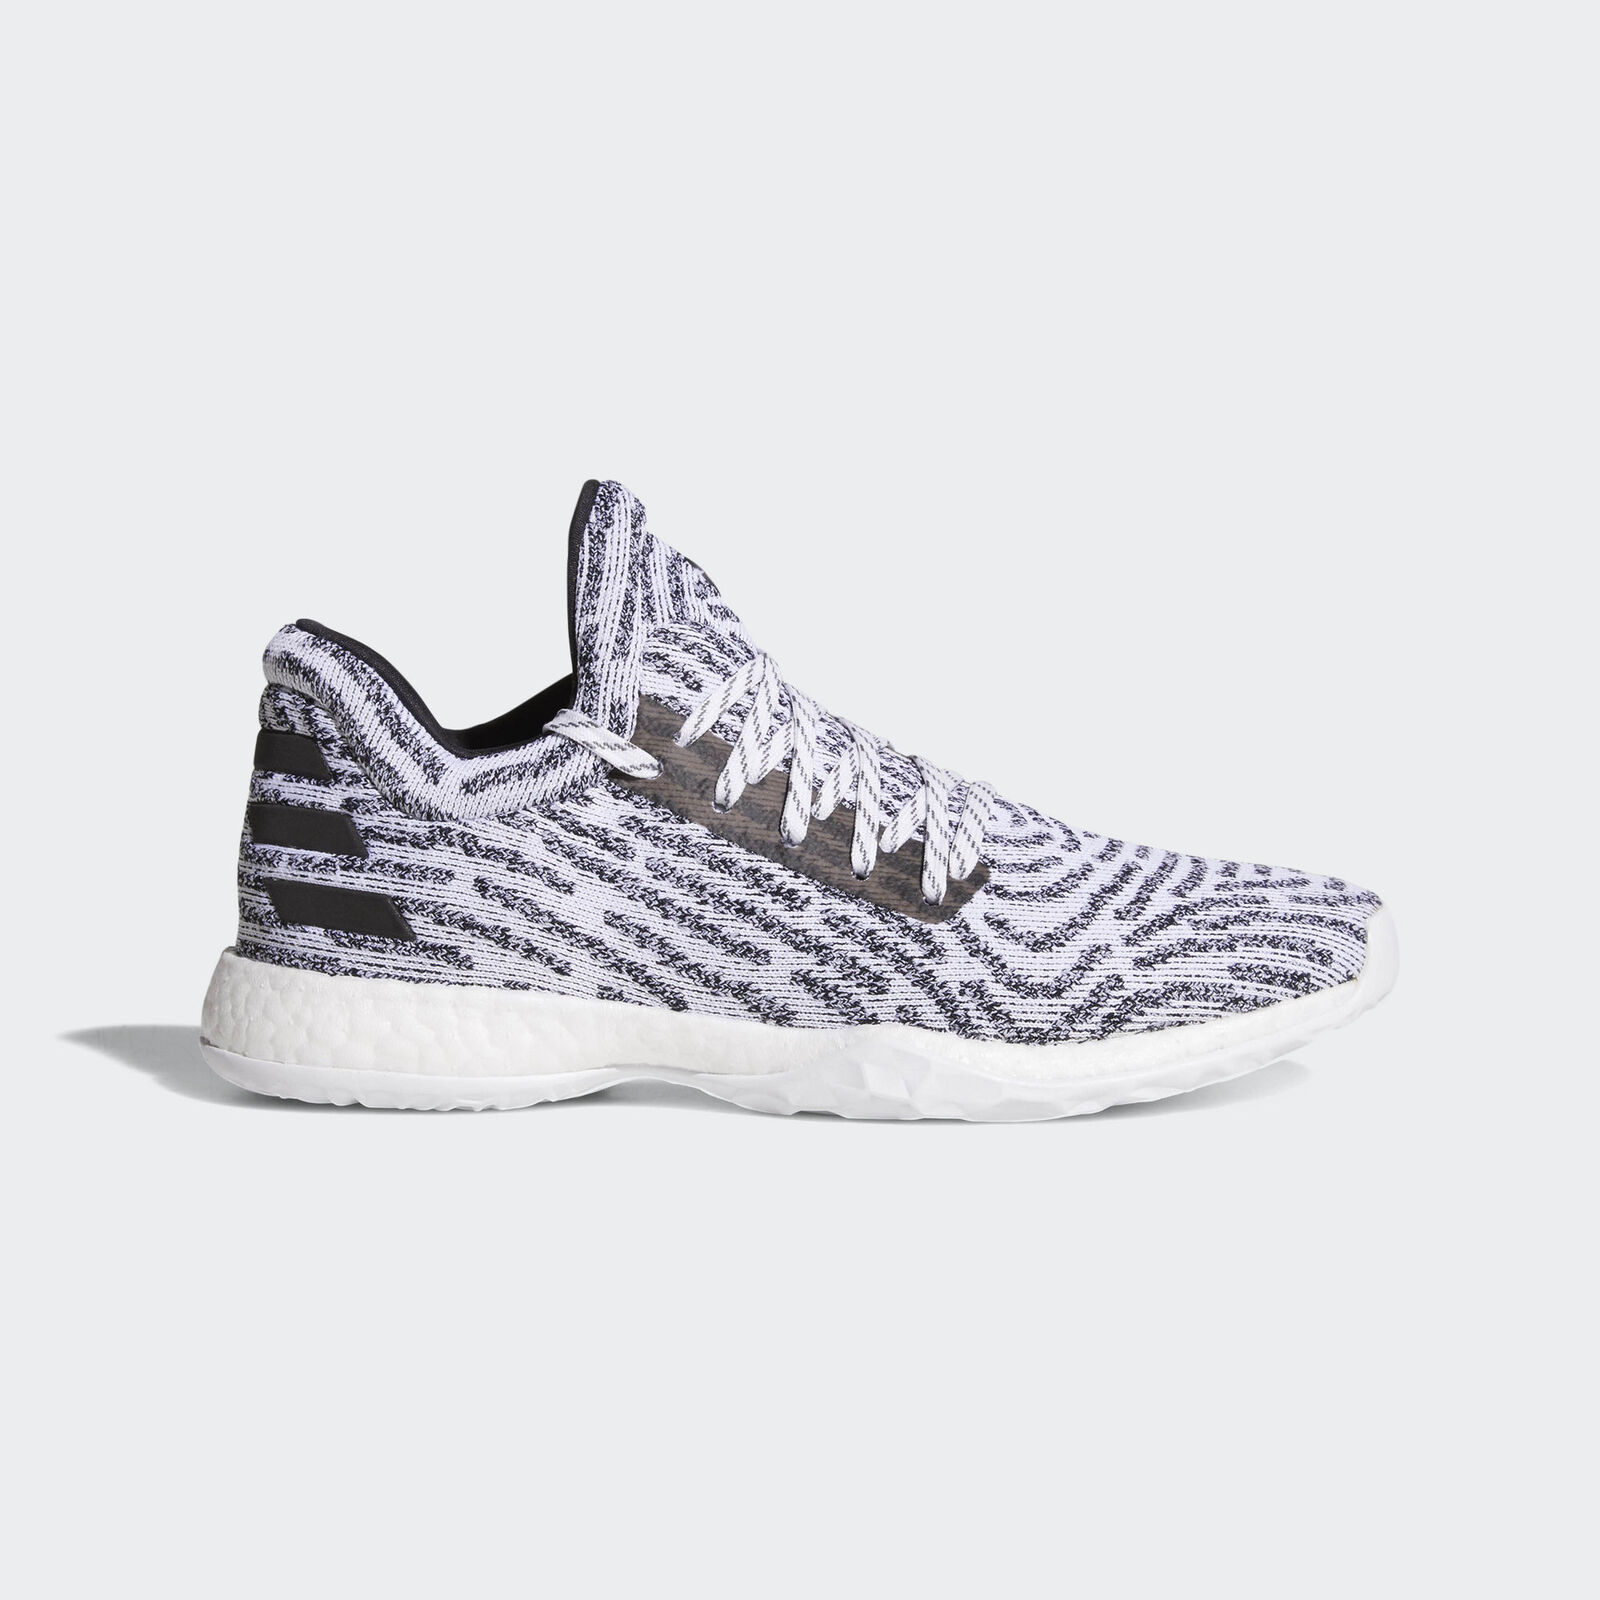 Adidas Harden Vol. 1 LS Primeknit [AC8407] Men Basketball Shoes White/Black